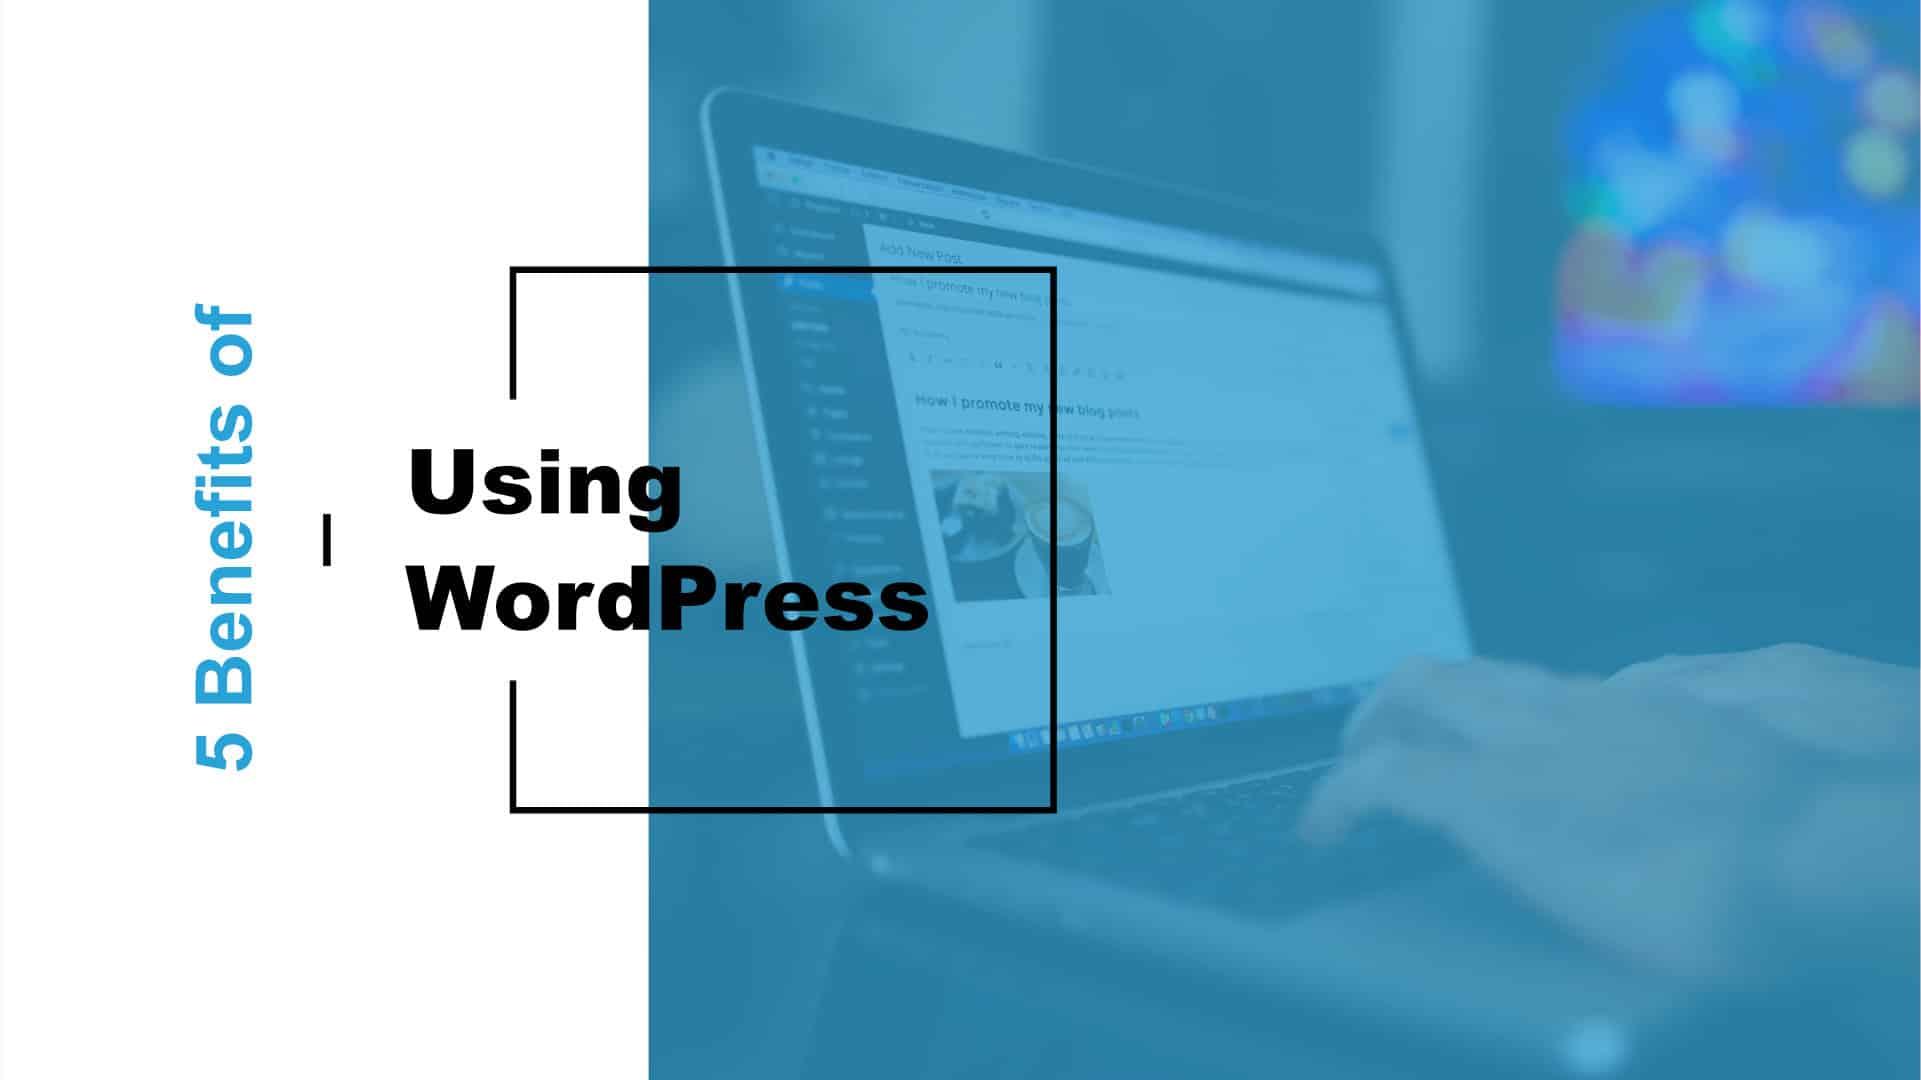 Five Benefits of Using WordPress Featured Image